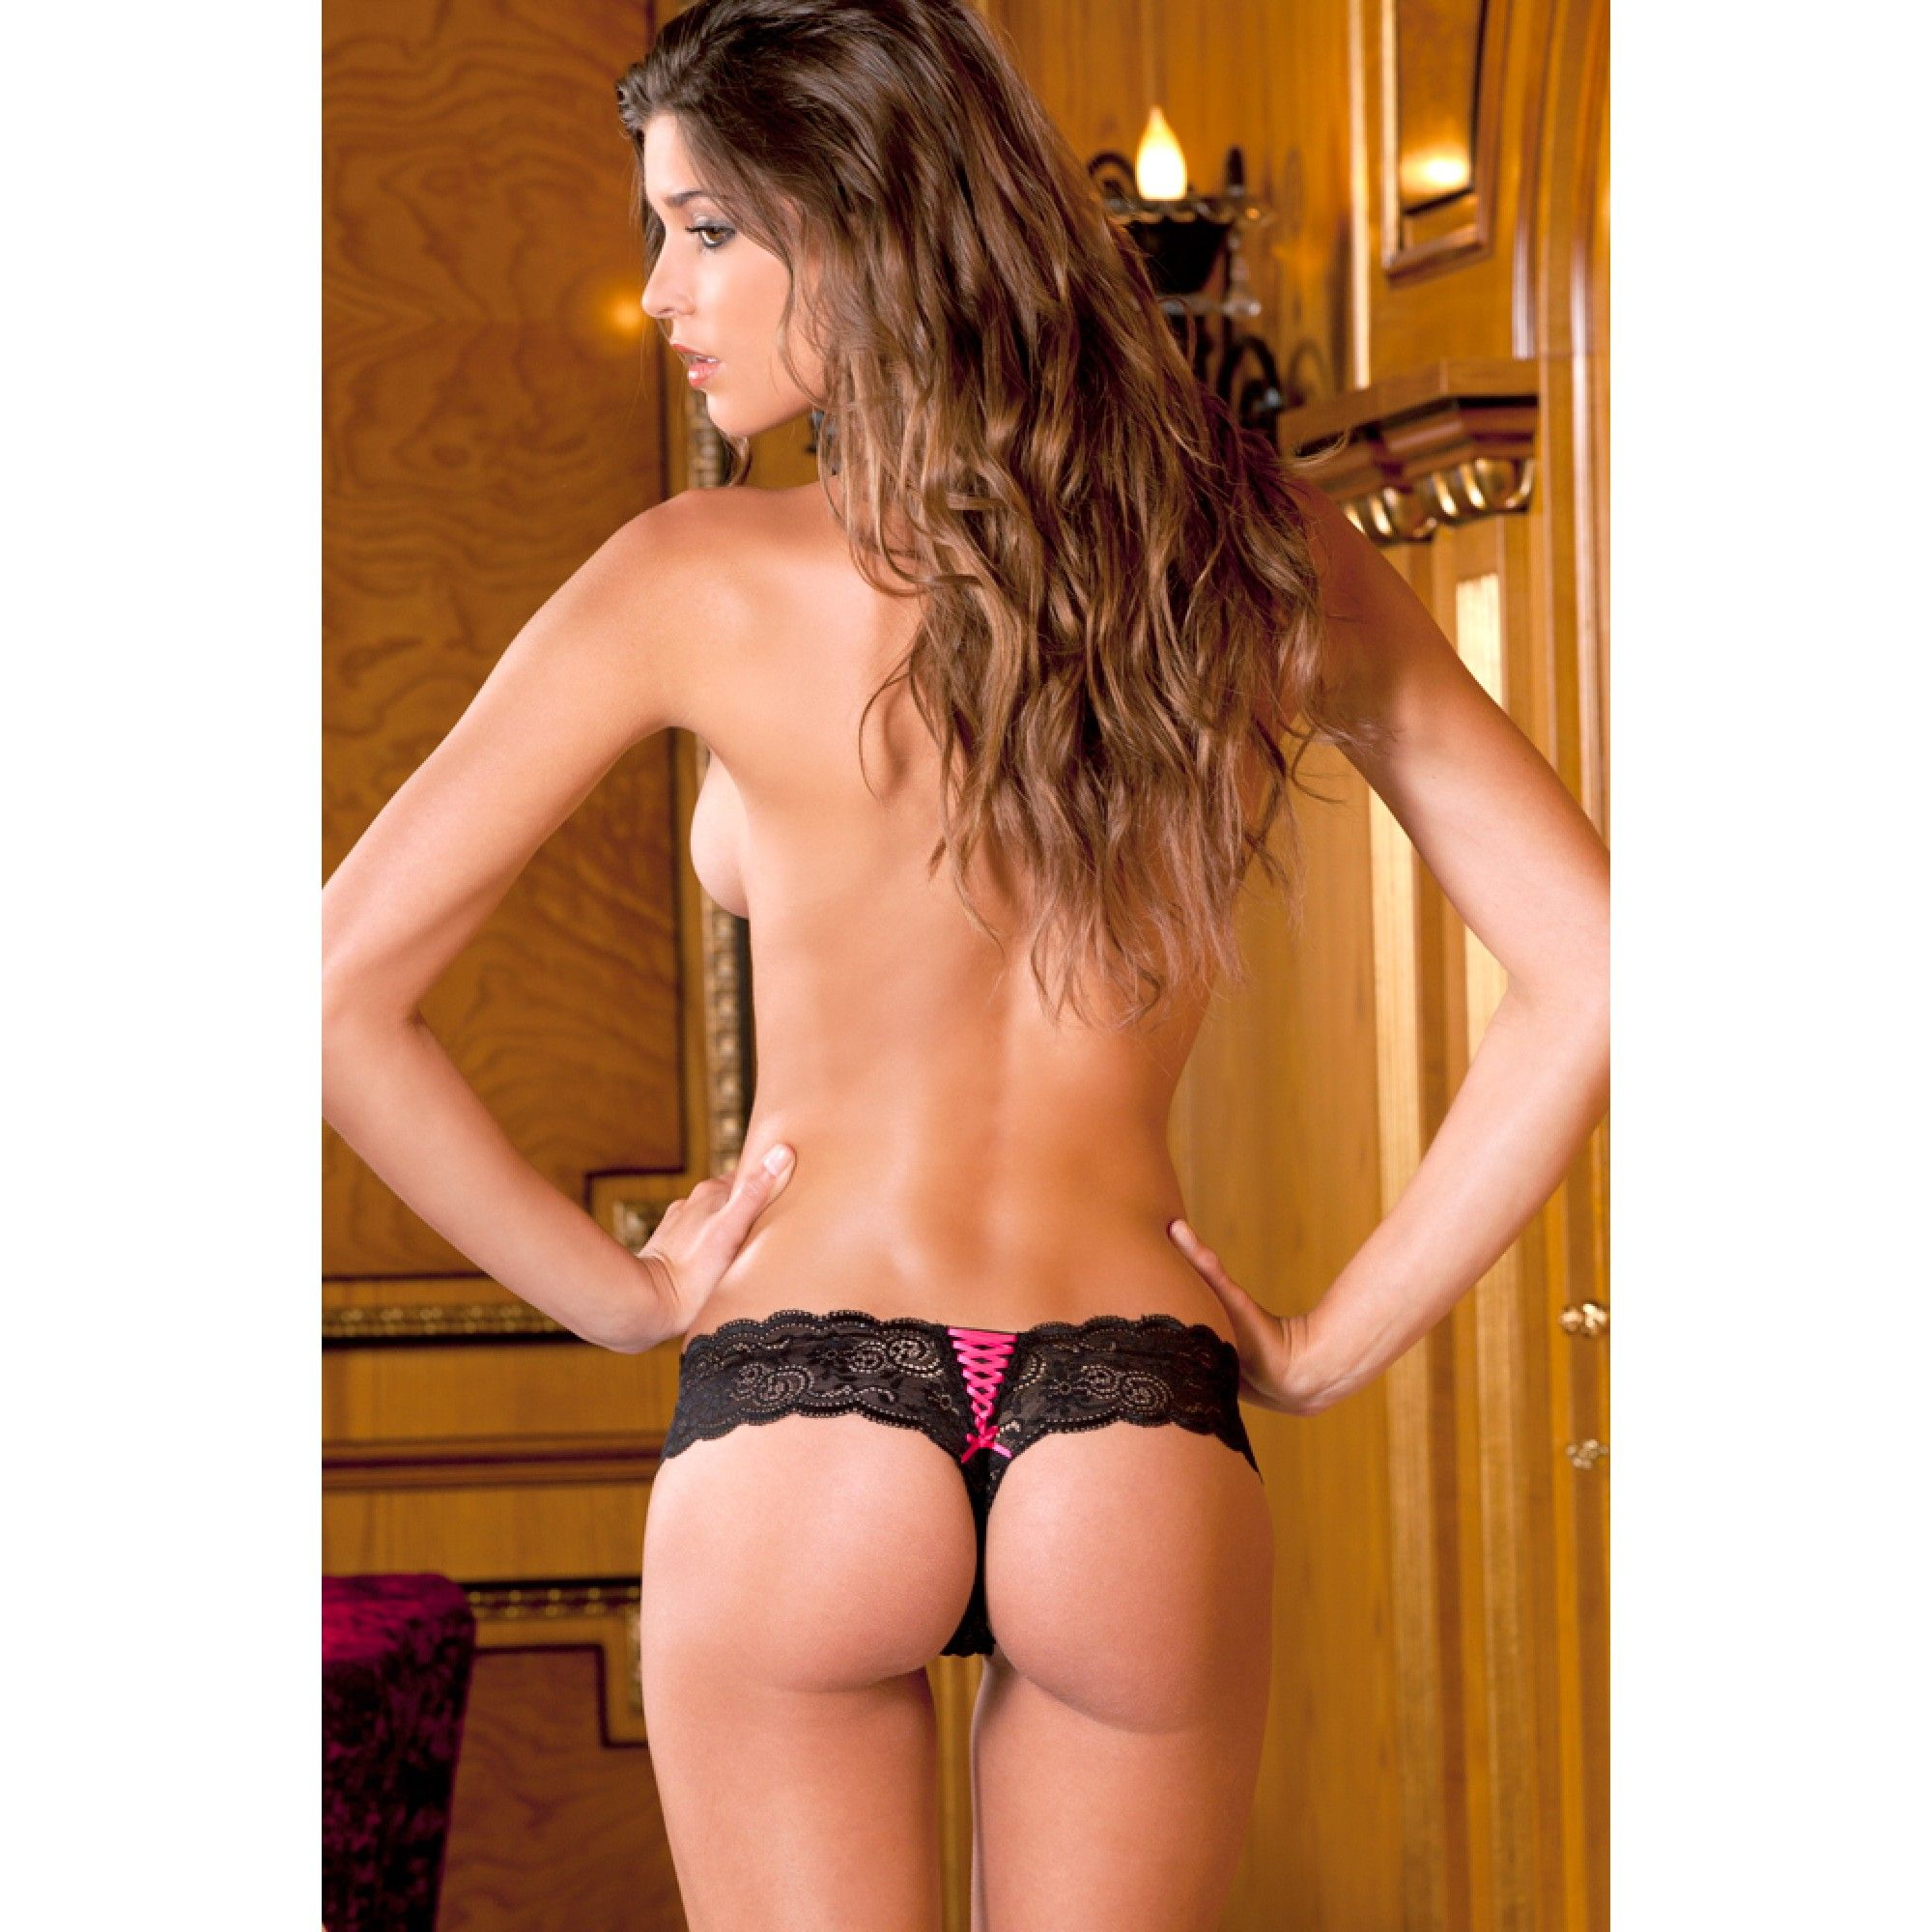 sexiga underkläder butik msn inlogg